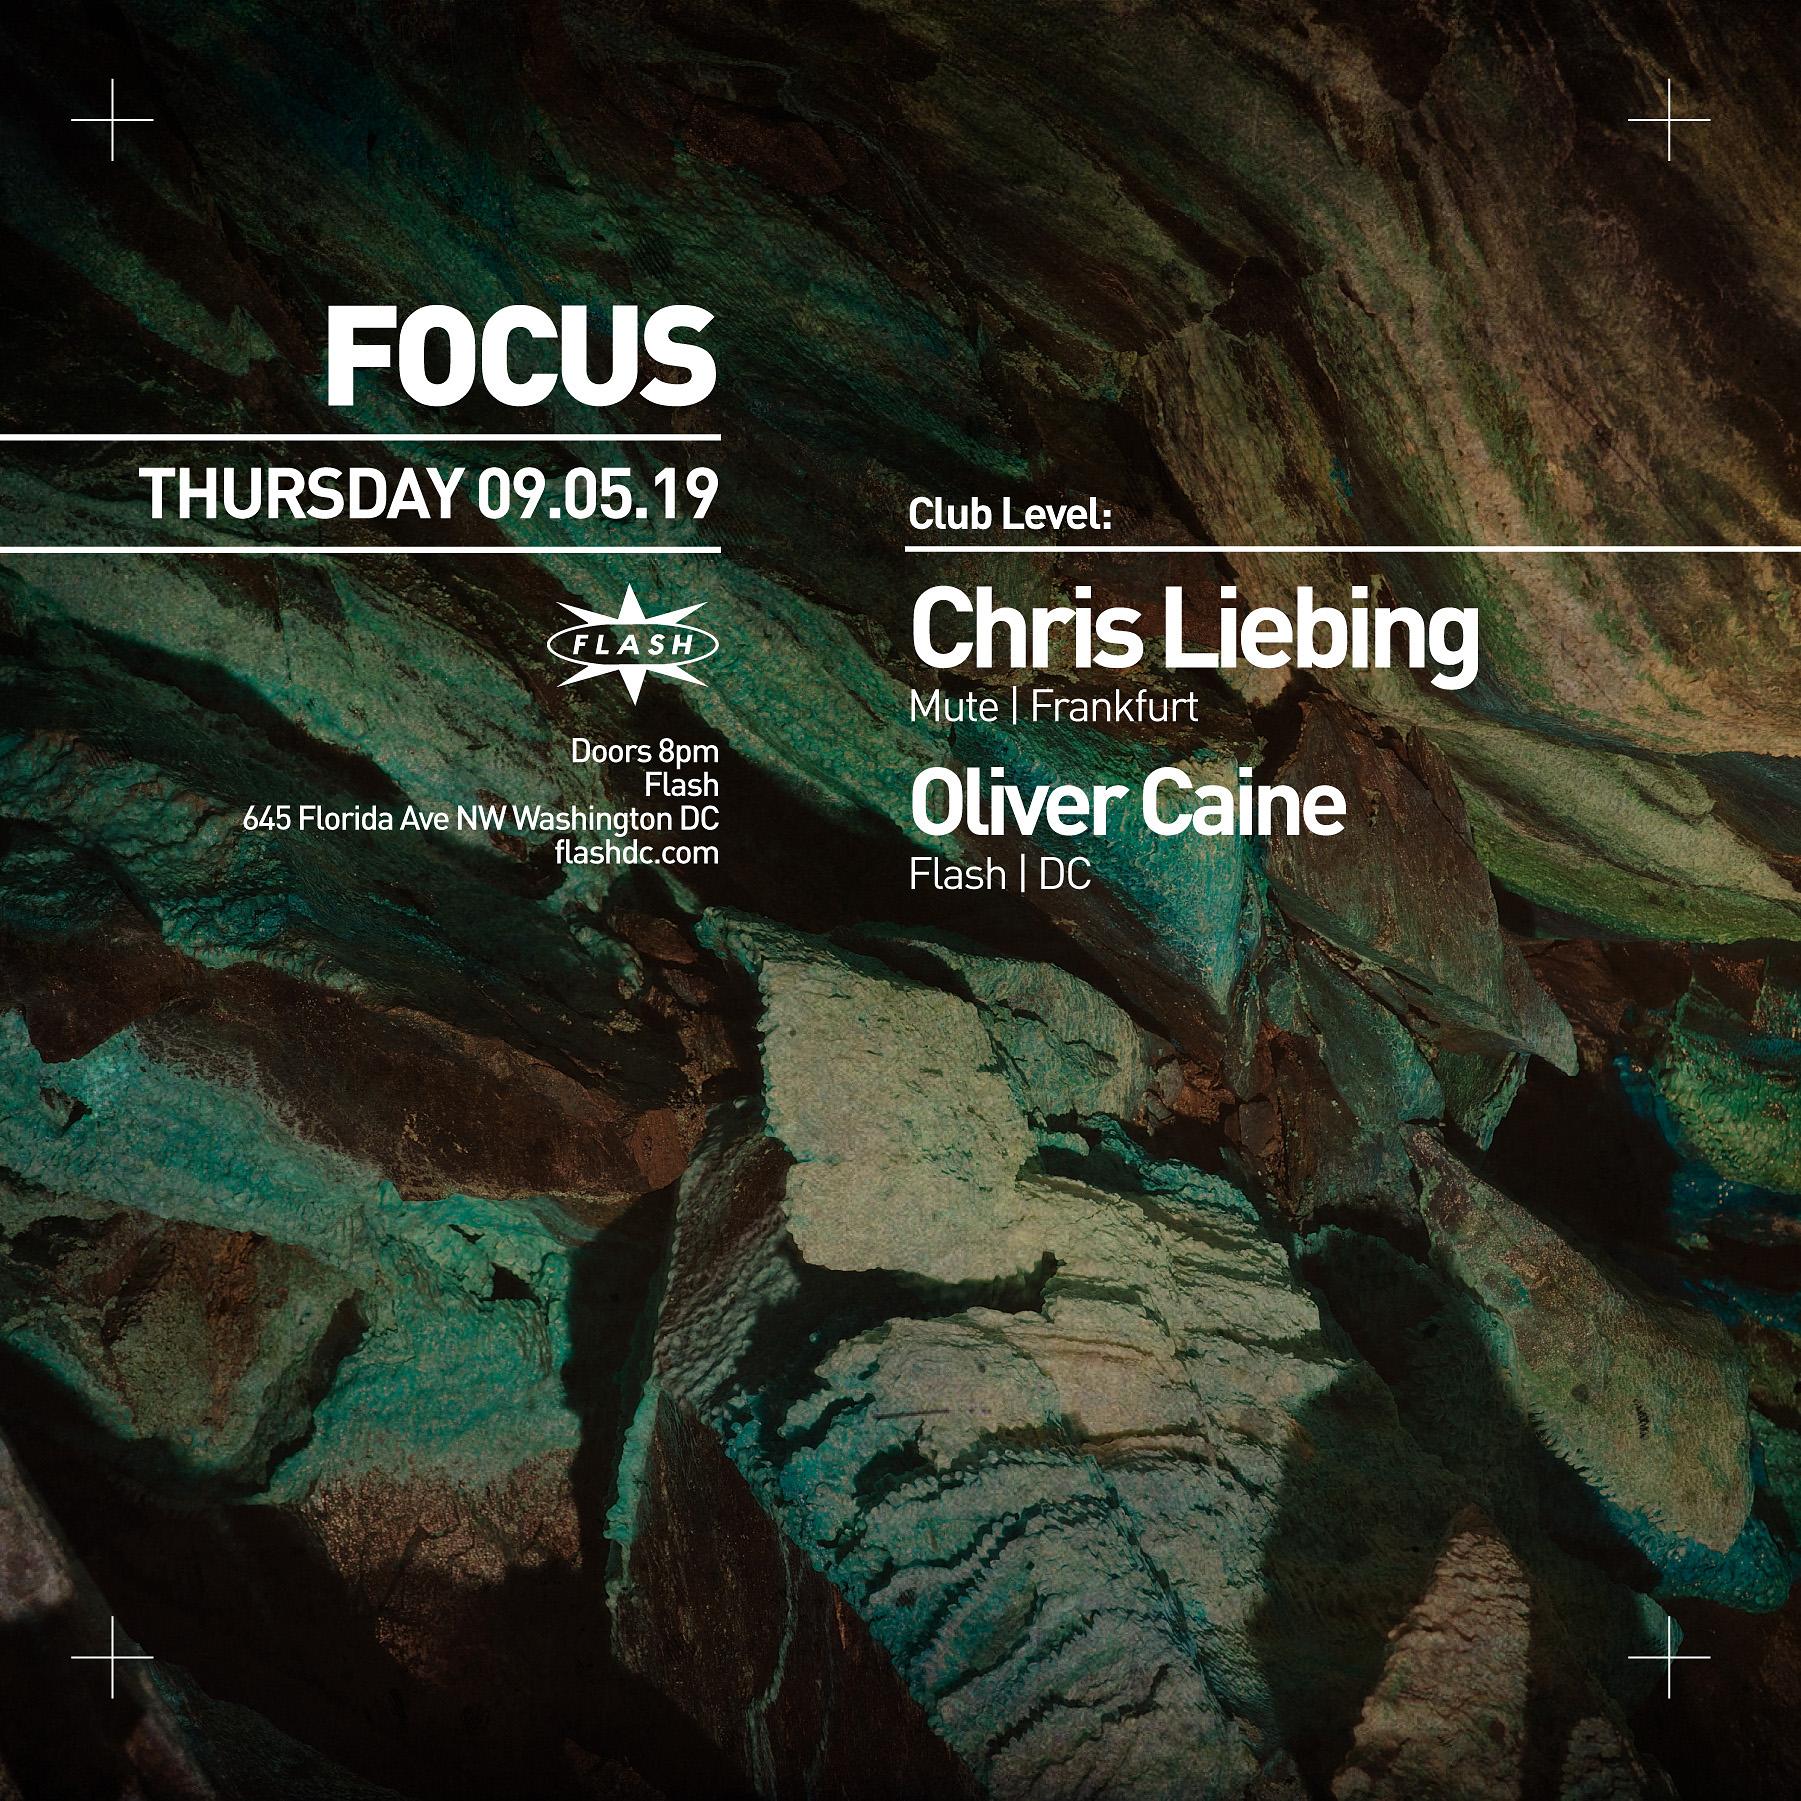 FOCUS: Chris Liebing event thumbnail